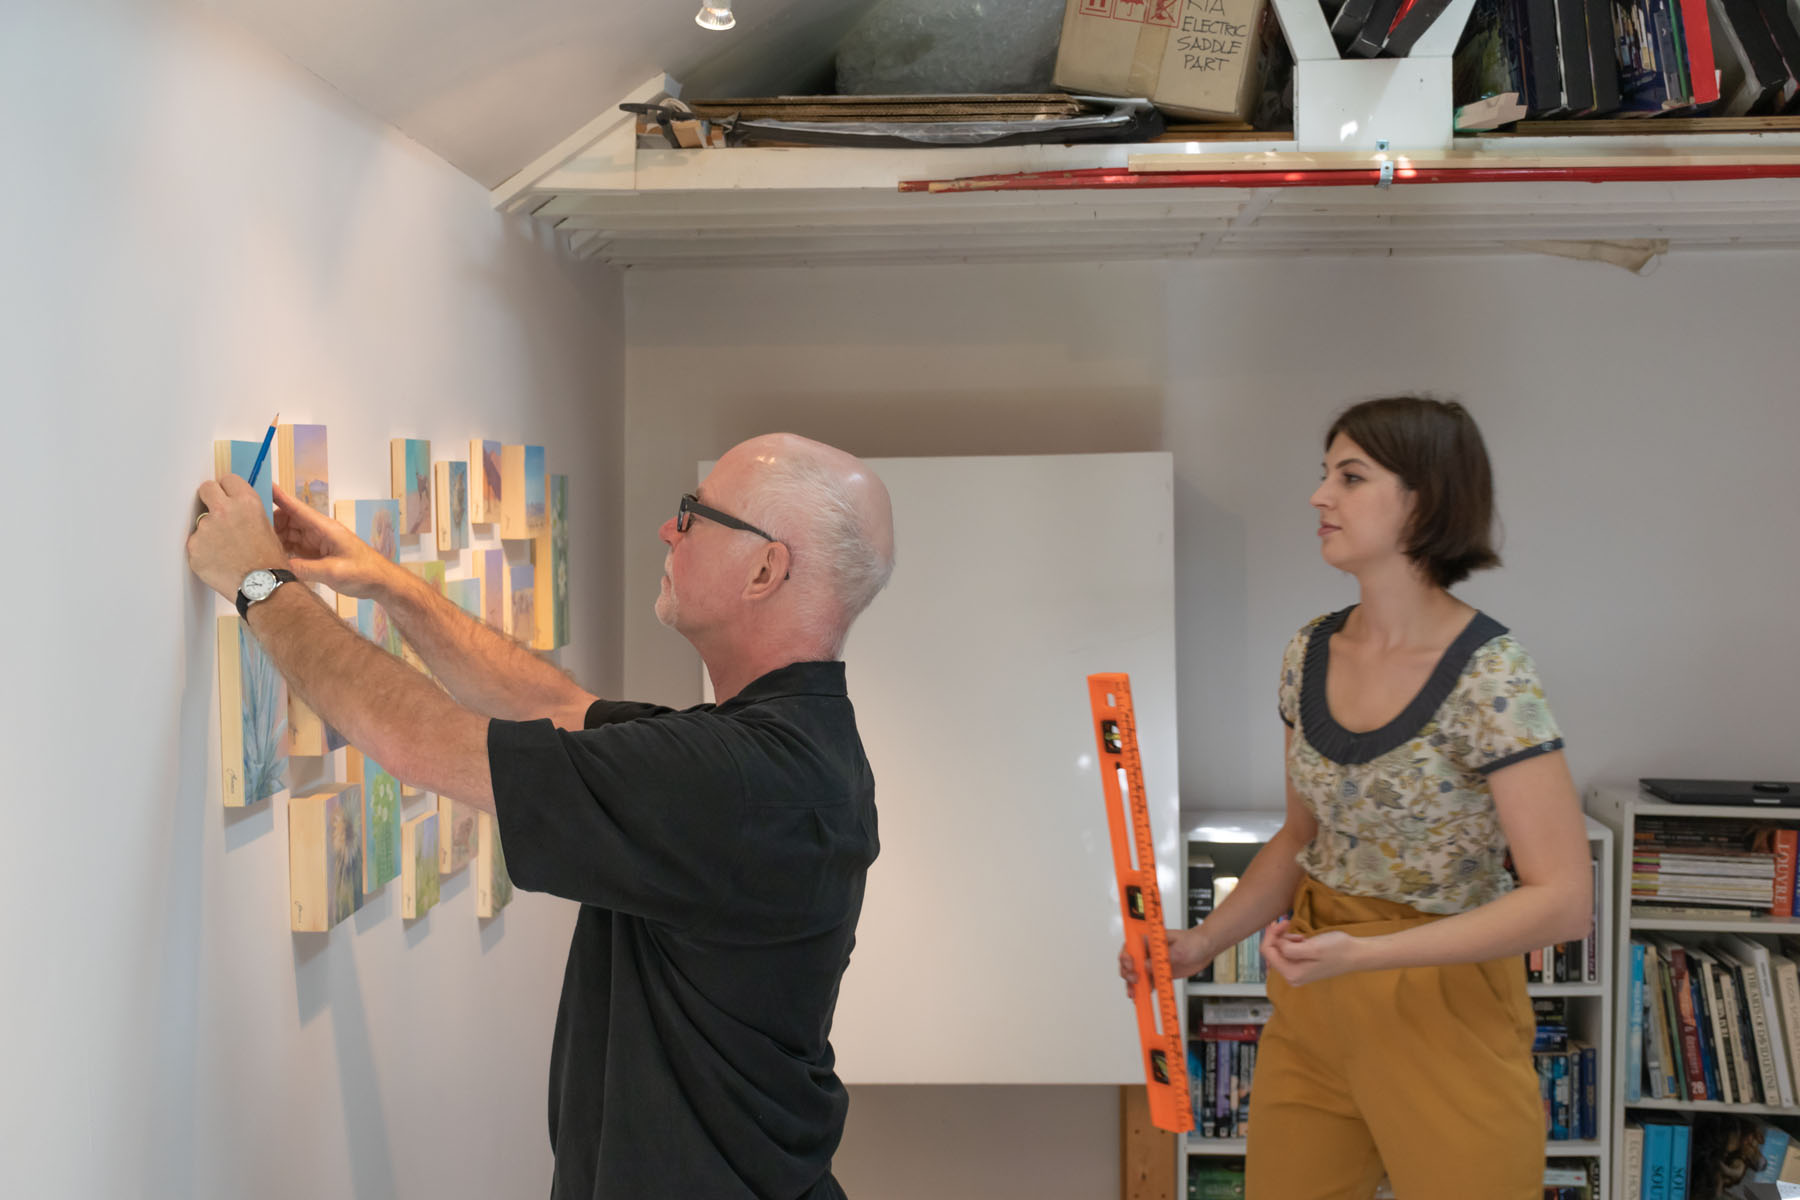 Hanging Jominca's paintings